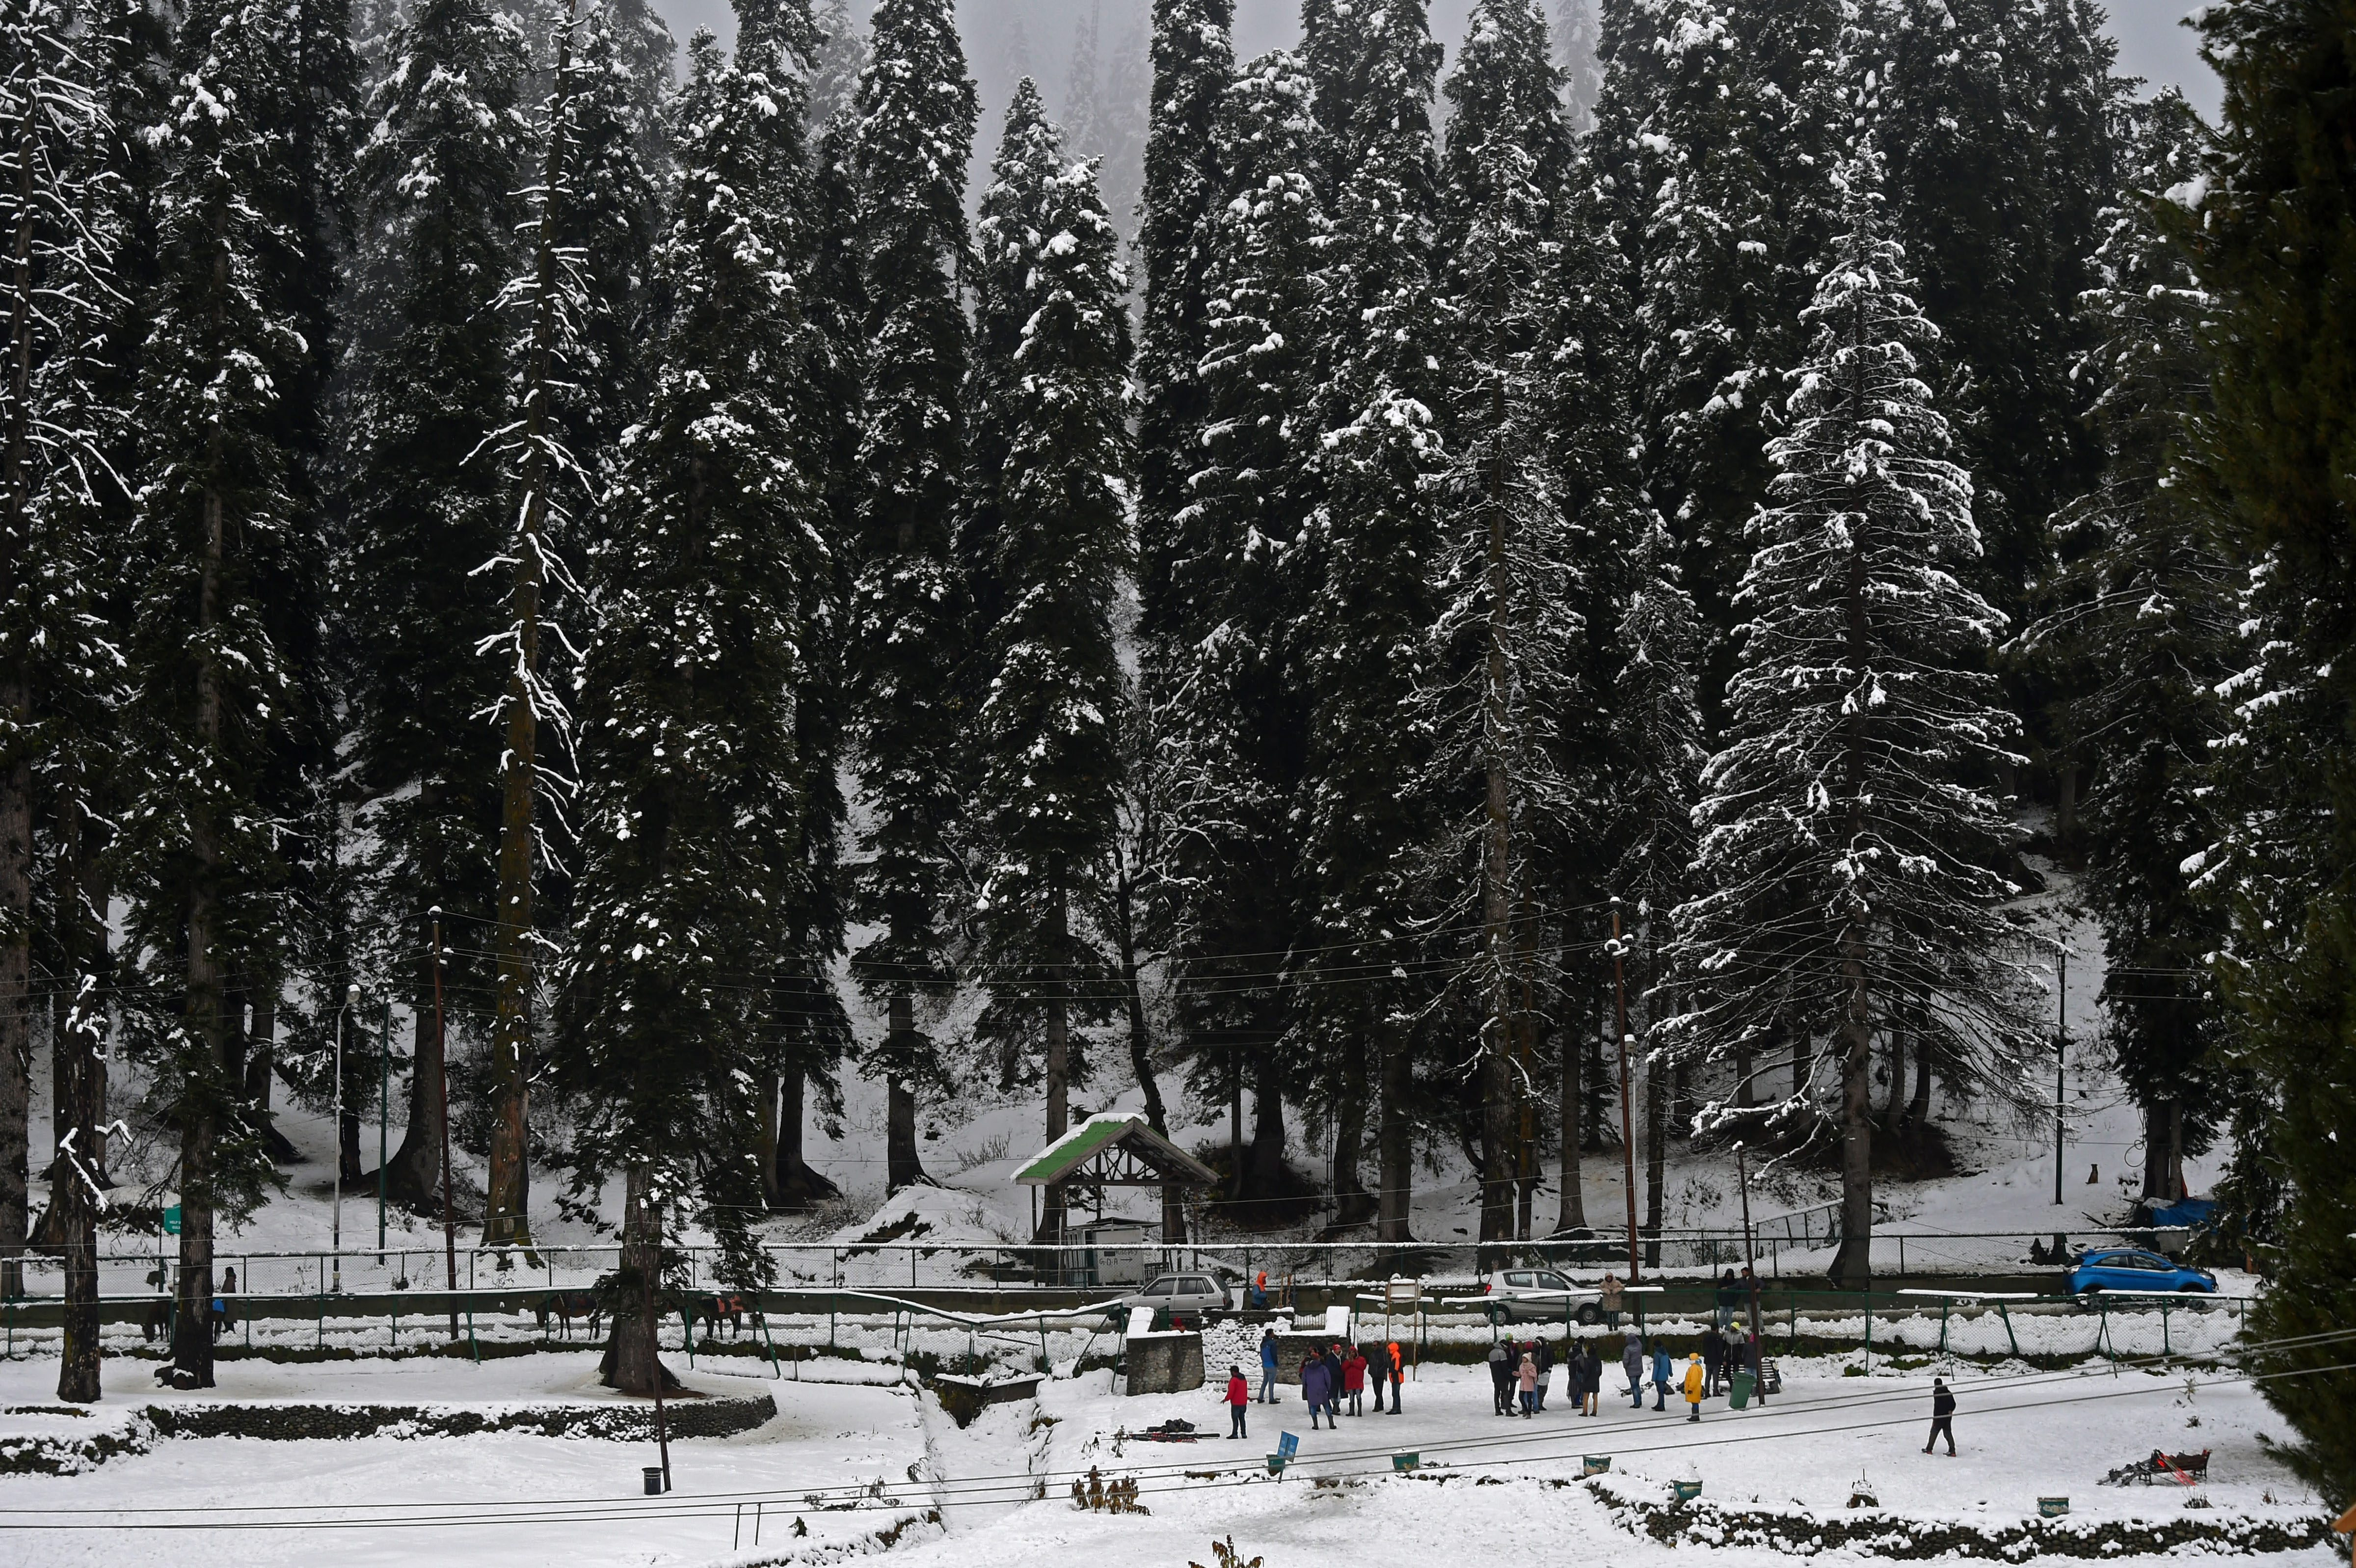 The ski resort of Gulmarg got nearly six inches of snow.